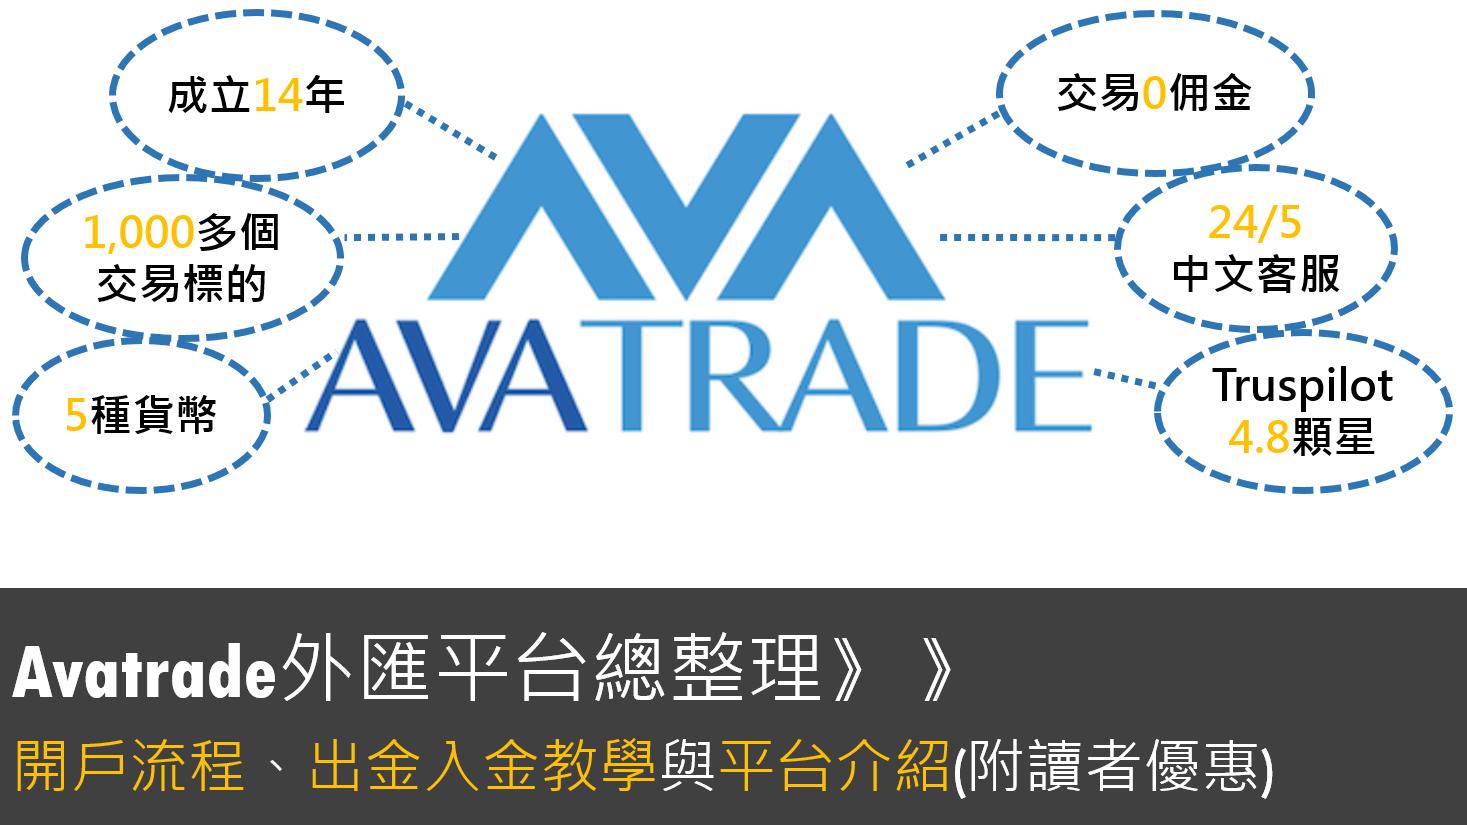 Avatrade介紹